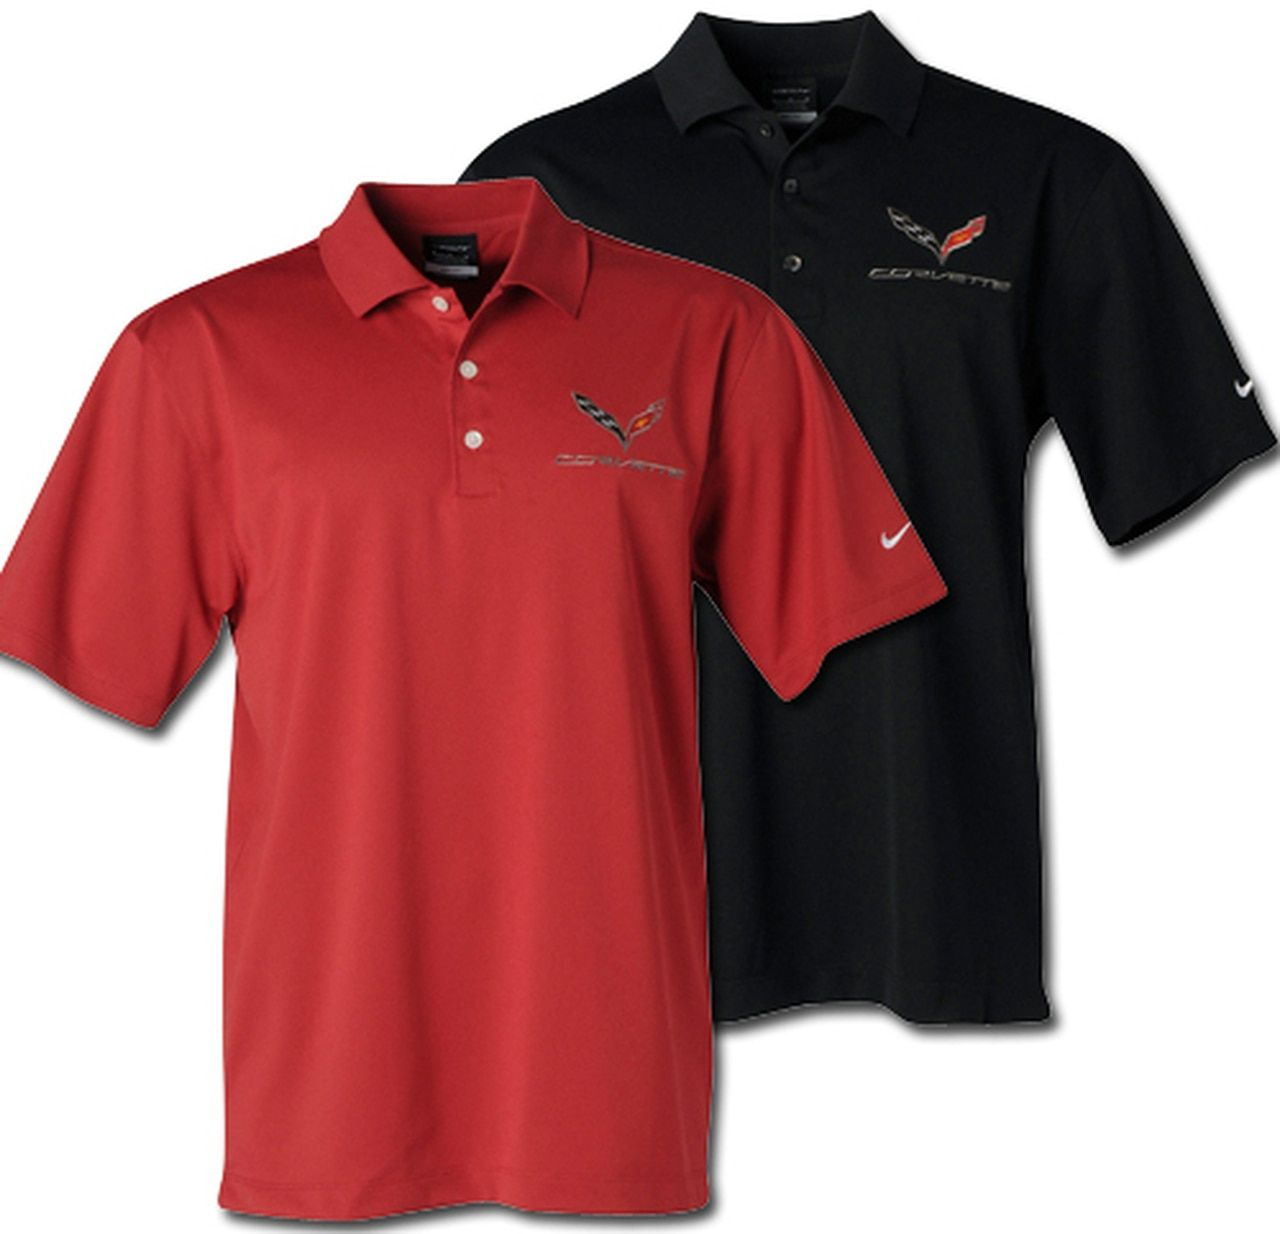 C7 Corvette Dri Fit Nike Polo Shirt In 2020 Nike Polo Shirts Men Shirt Style Performance Polos